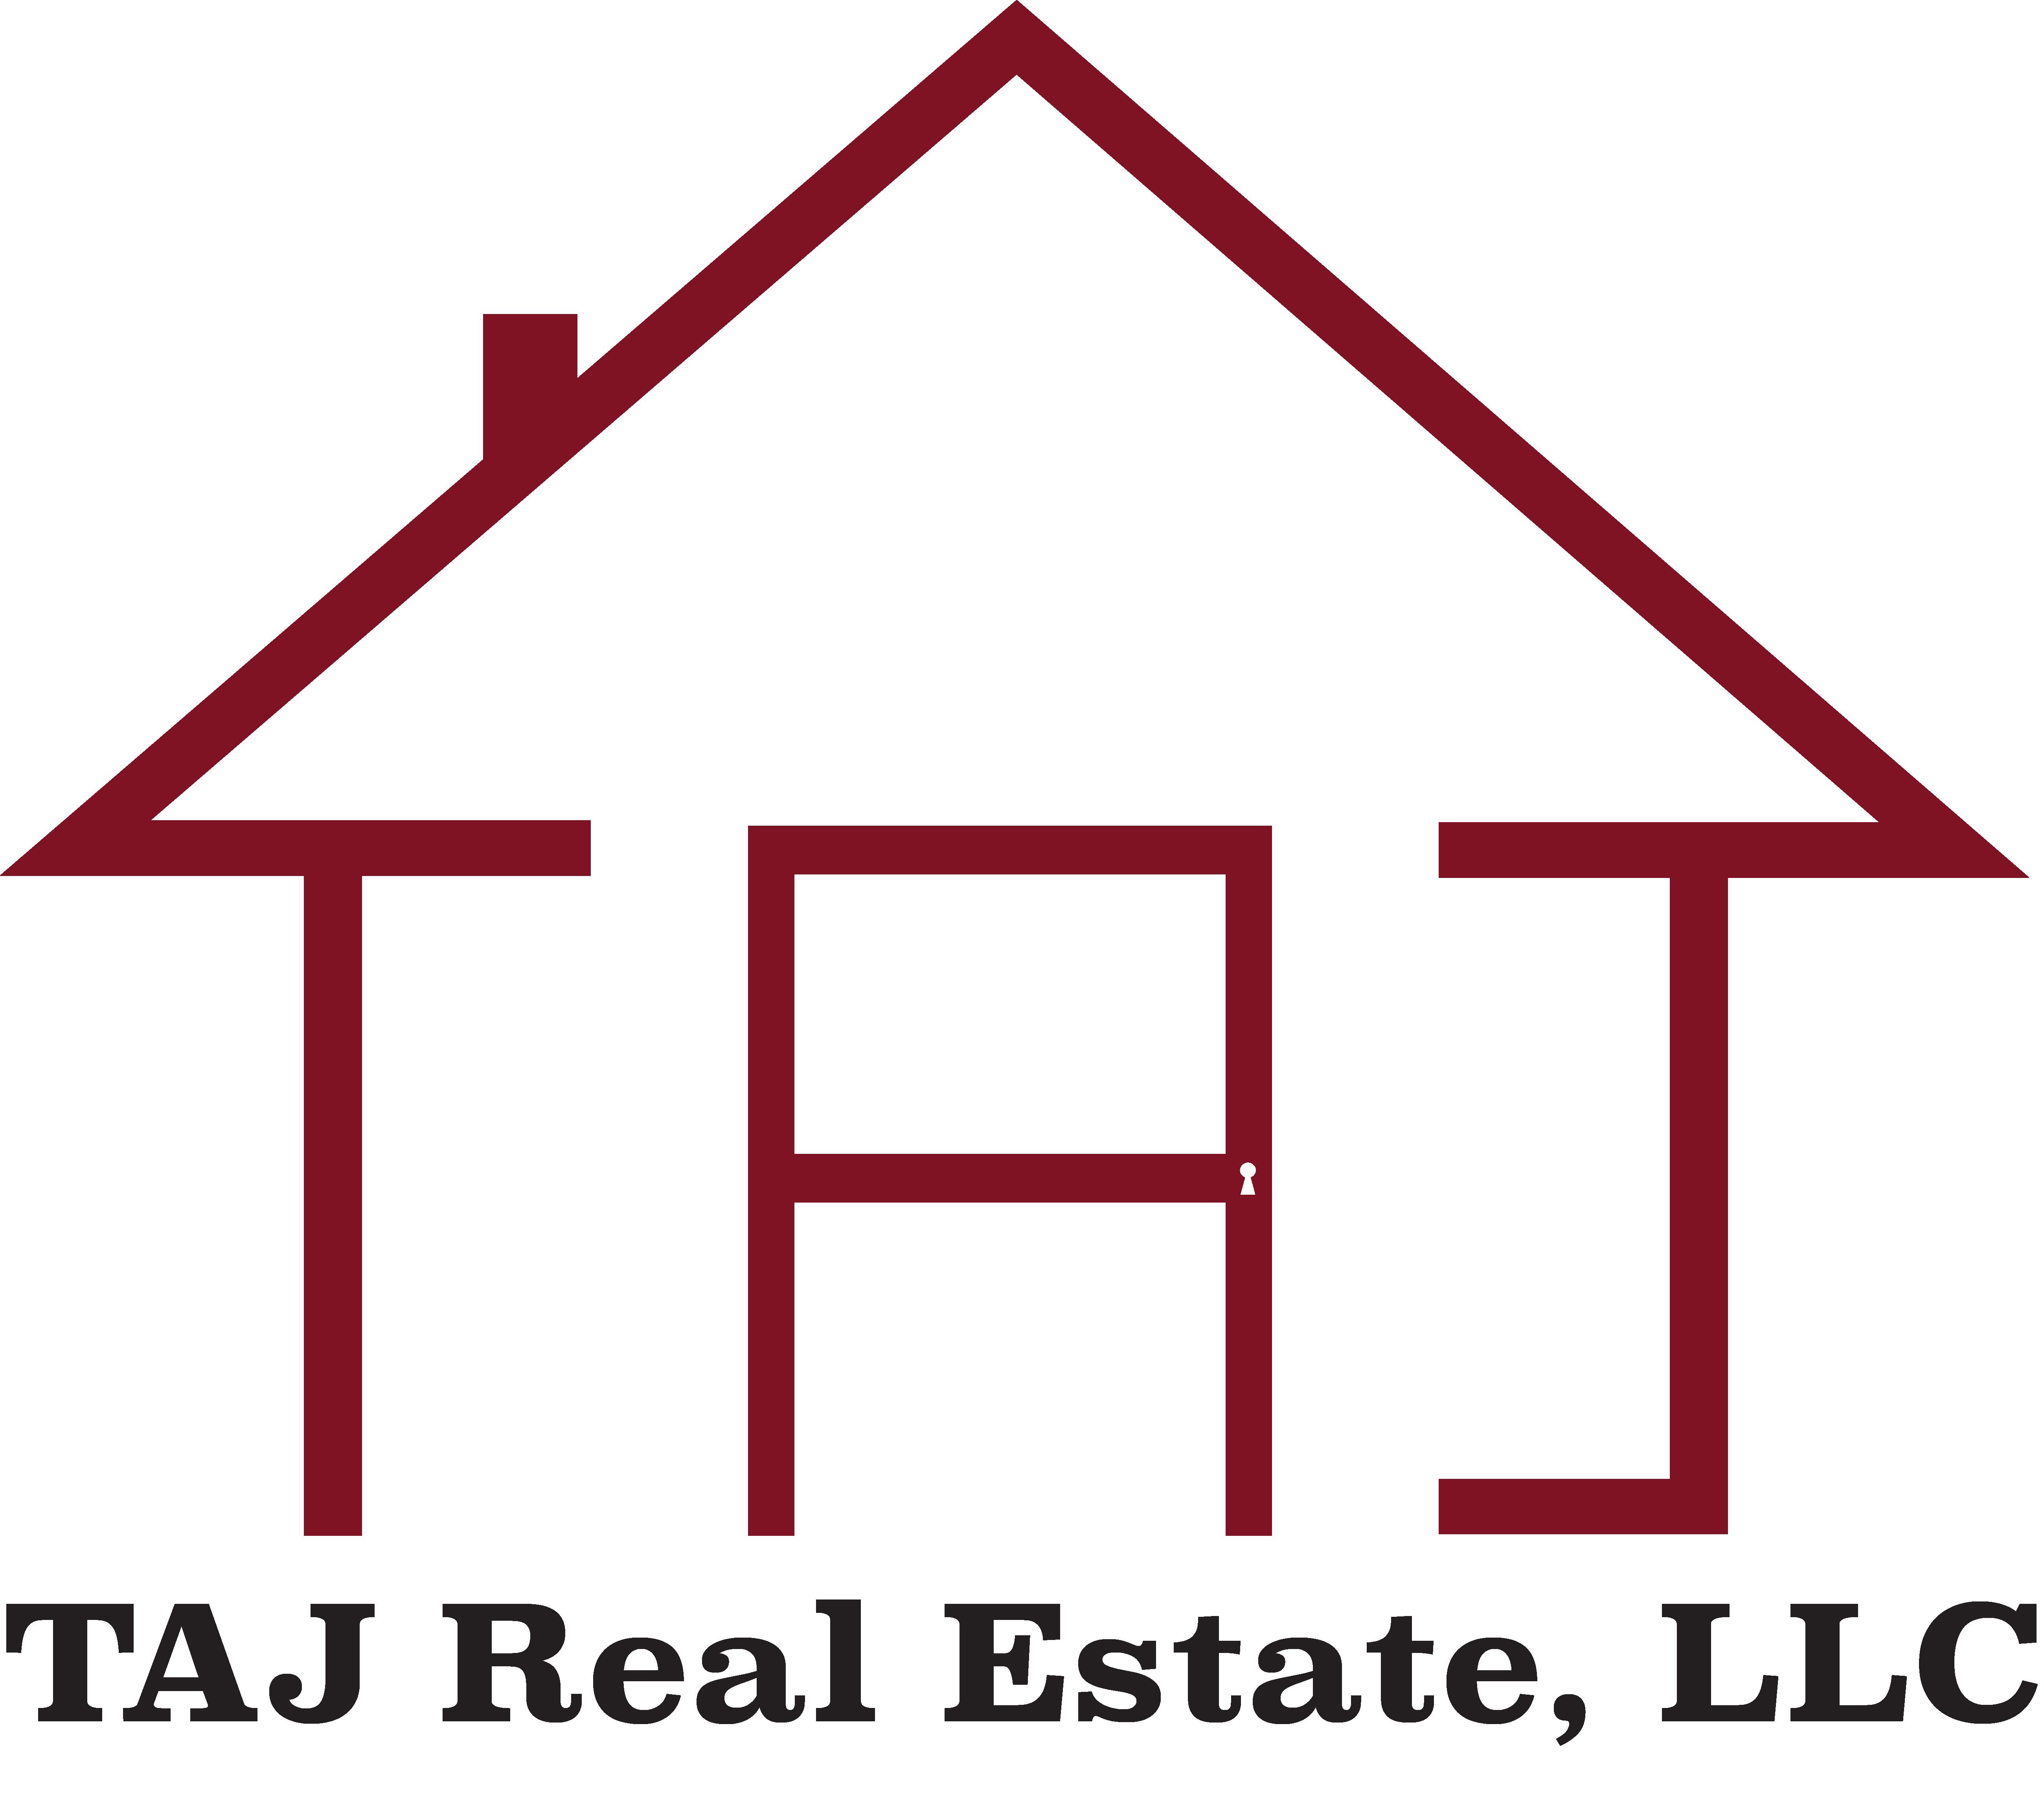 T A J Real Estate LLC